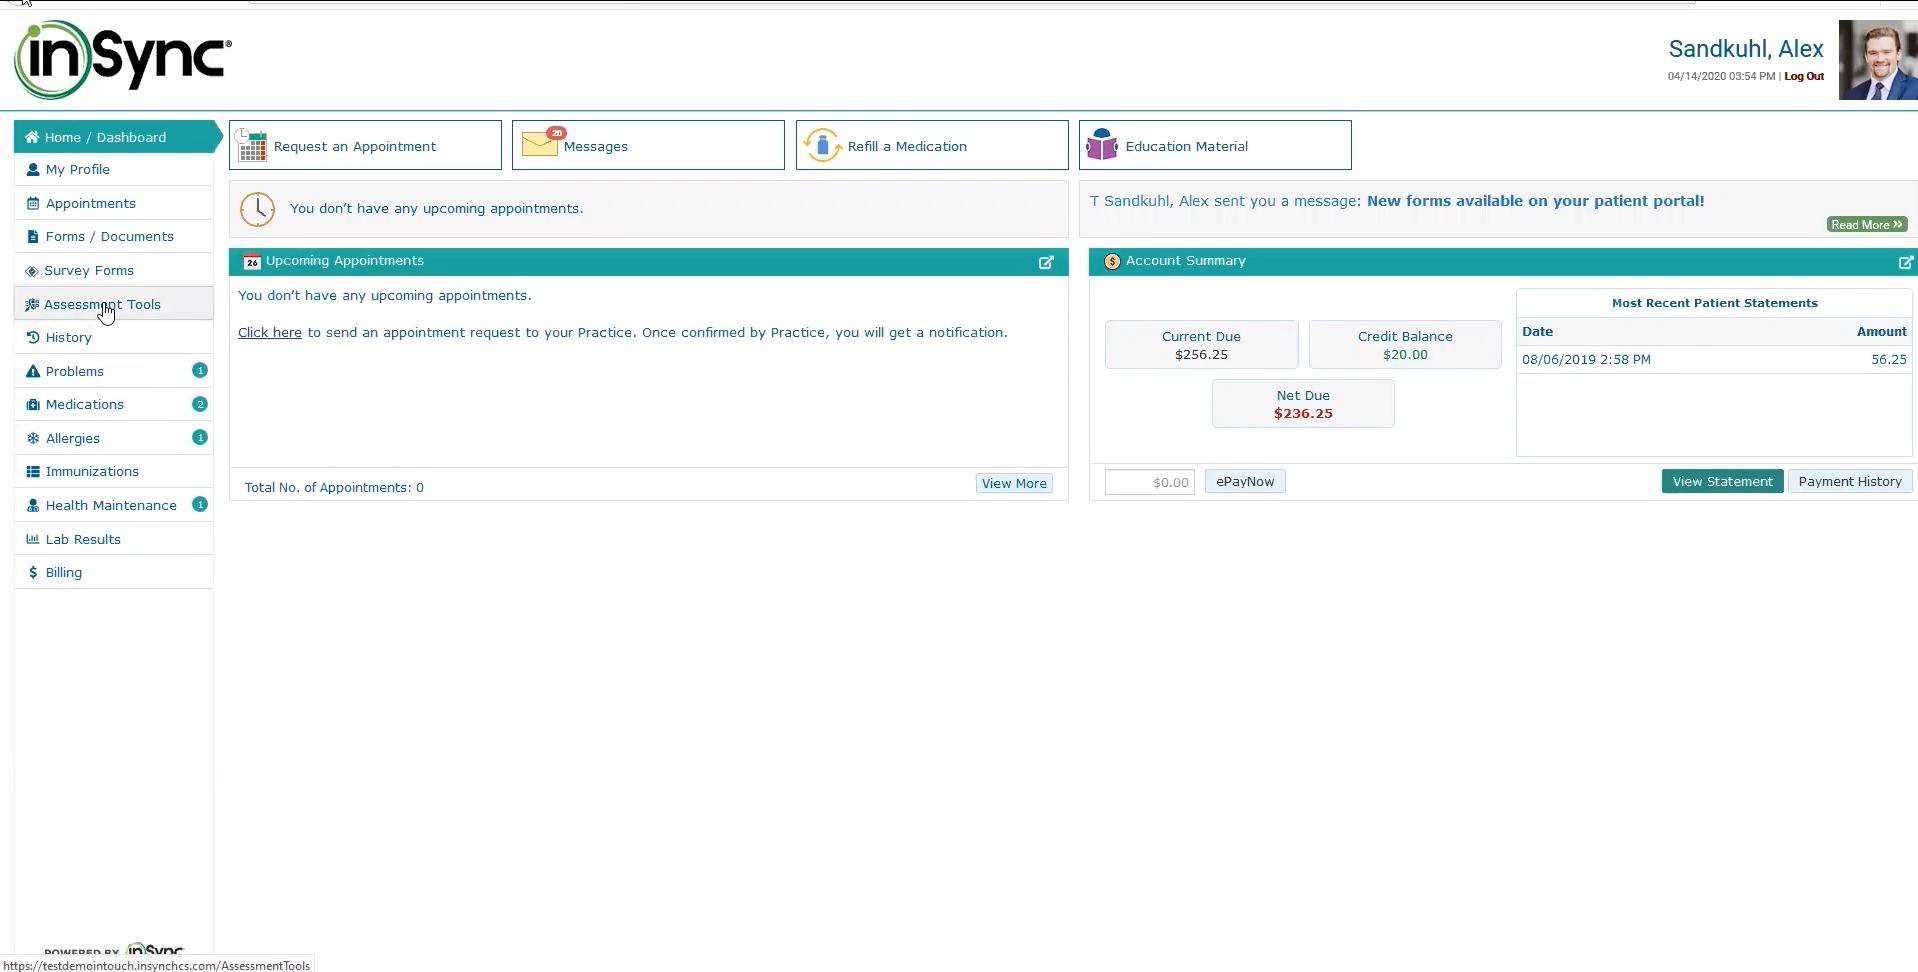 insync healthcare solutions patient portal website patient view